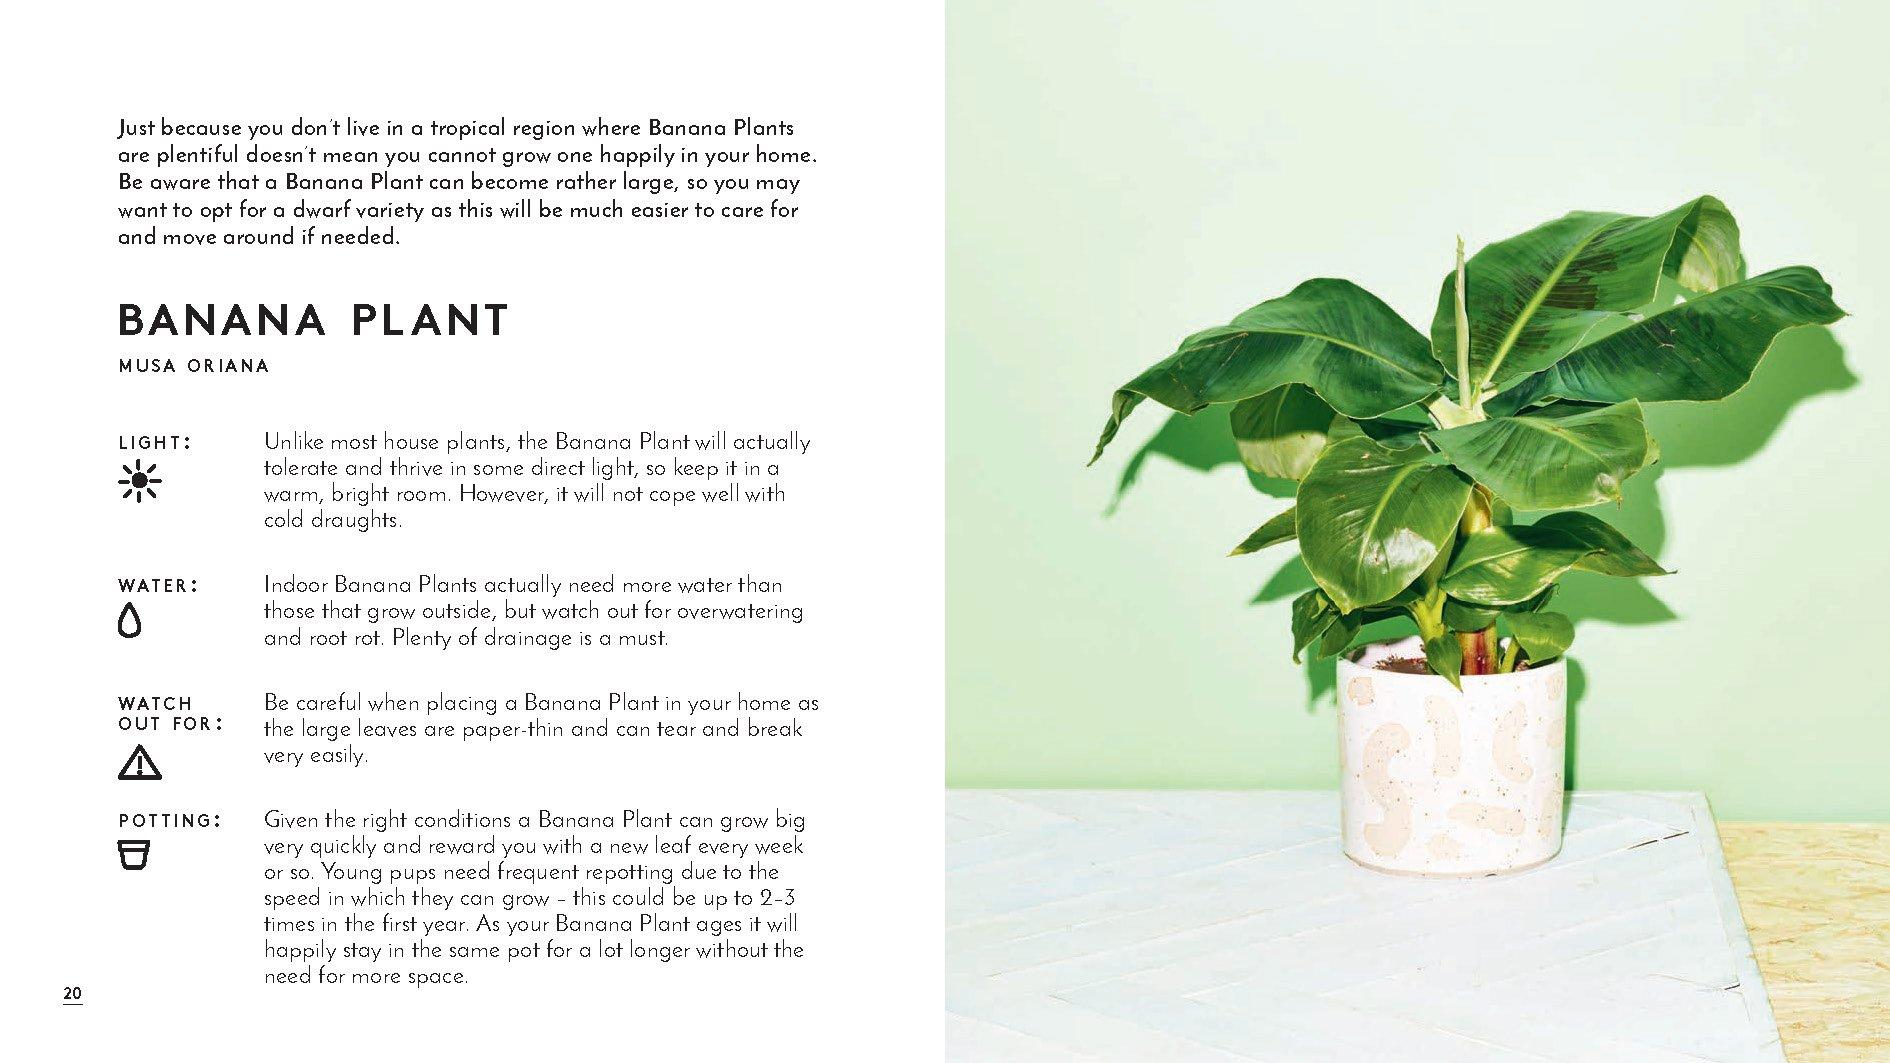 Little Book Of House Plants And Other Greenery Amazon De Sibley Emma Fremdsprachige Bucher